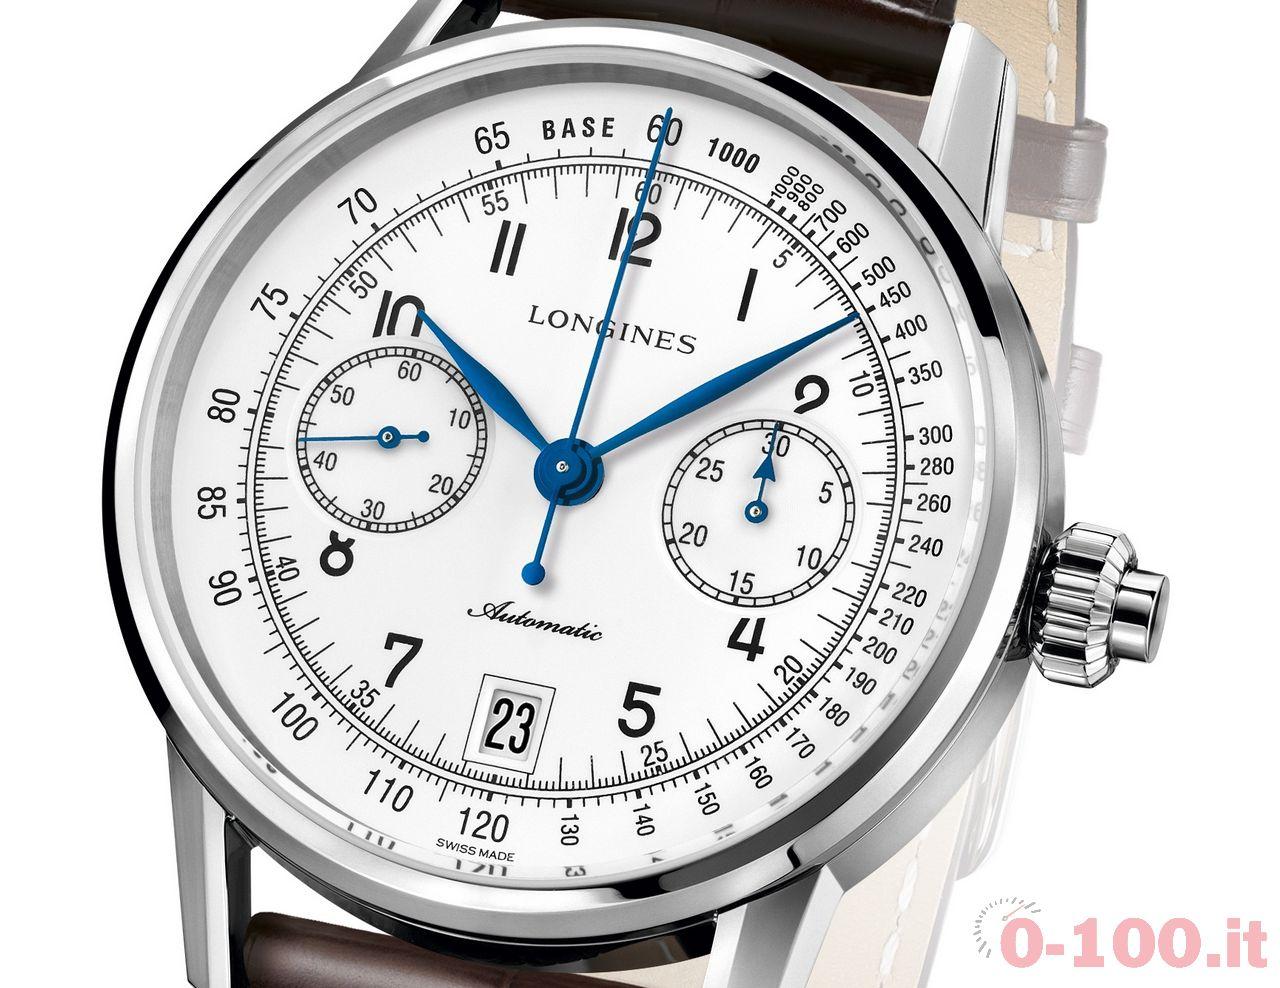 longines-column-wheel-single-push-piece-chronograph-price_0-1001